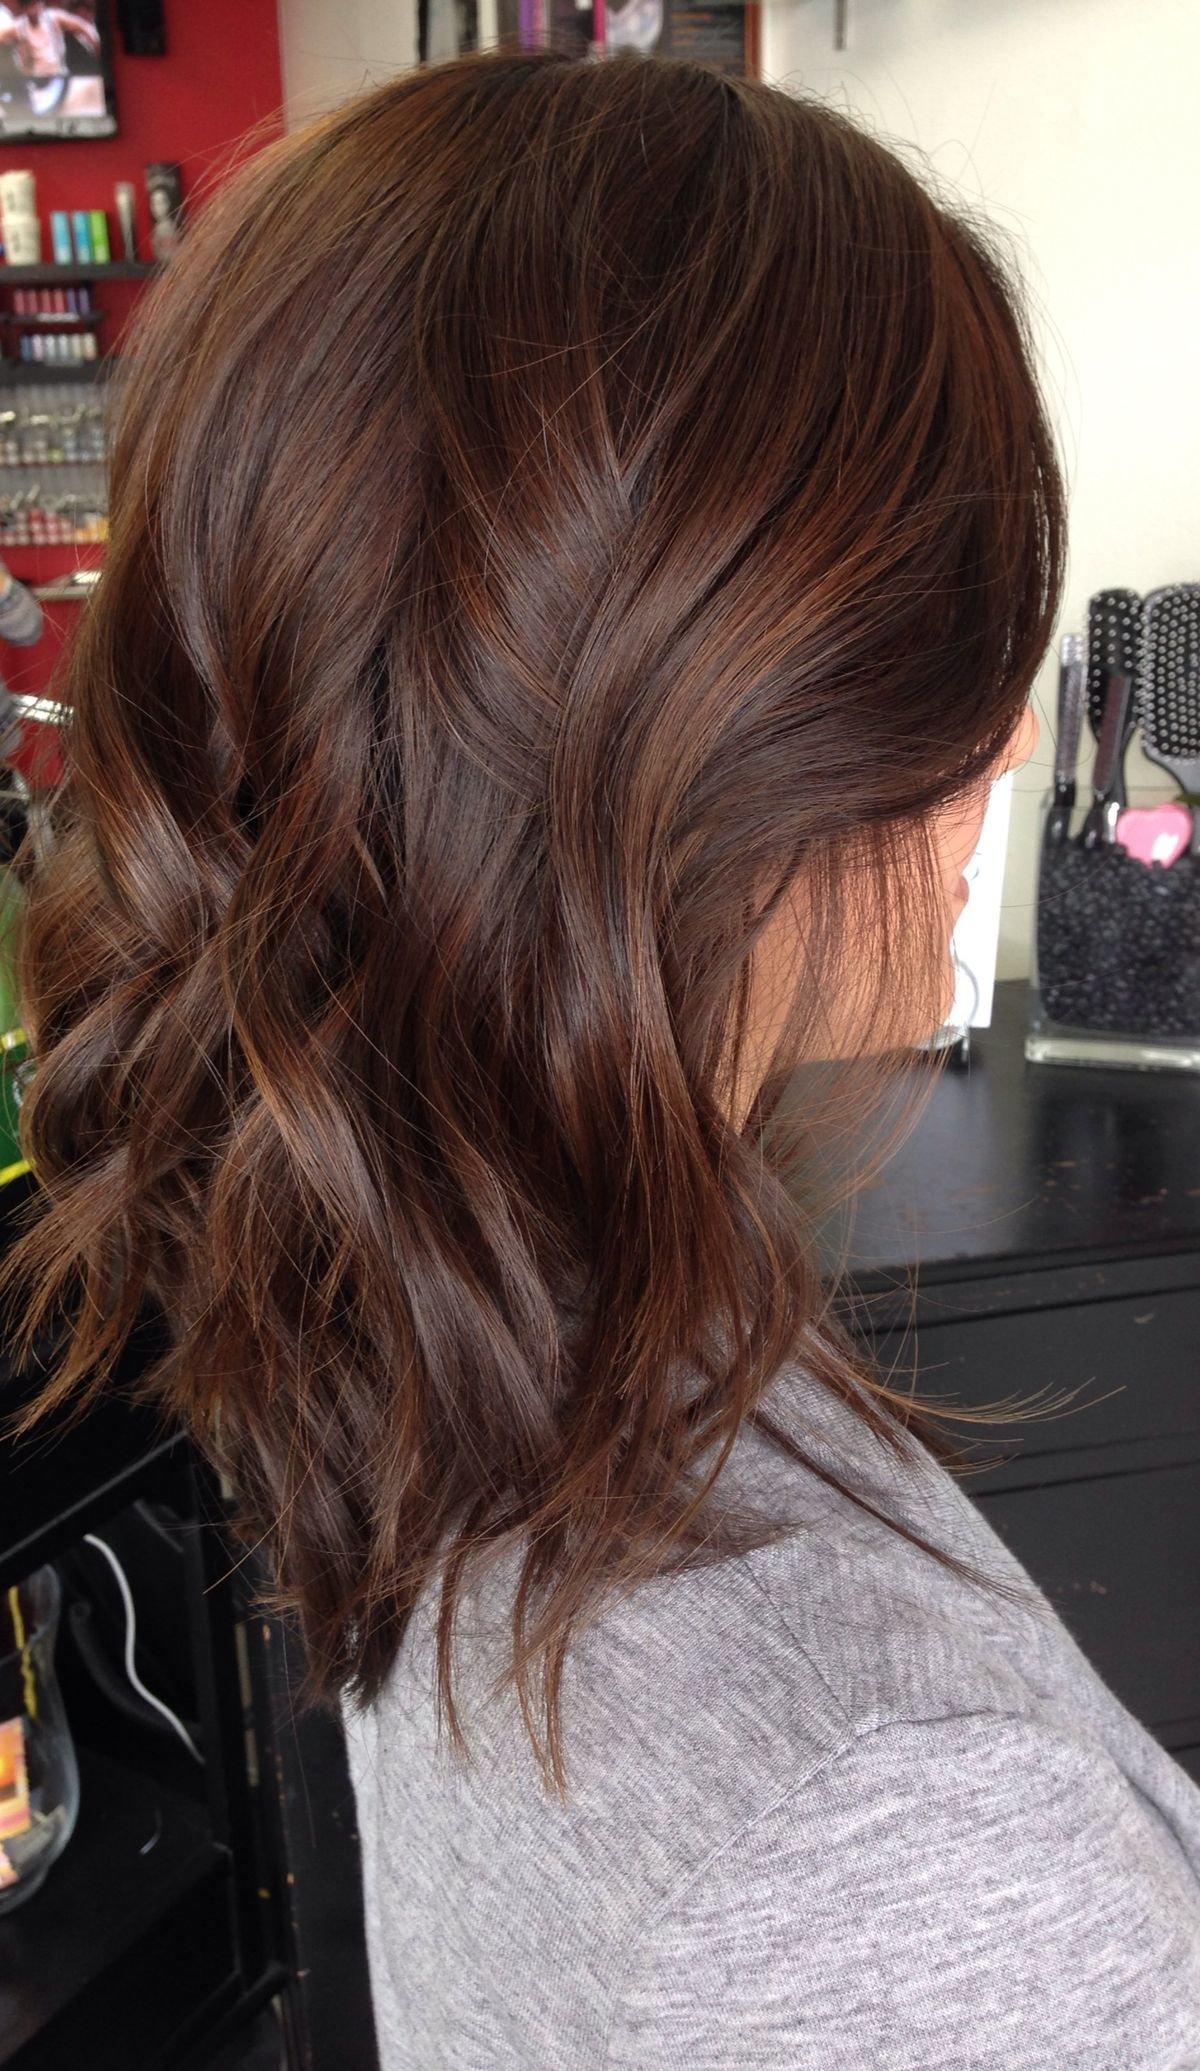 Dark caramel brown hair